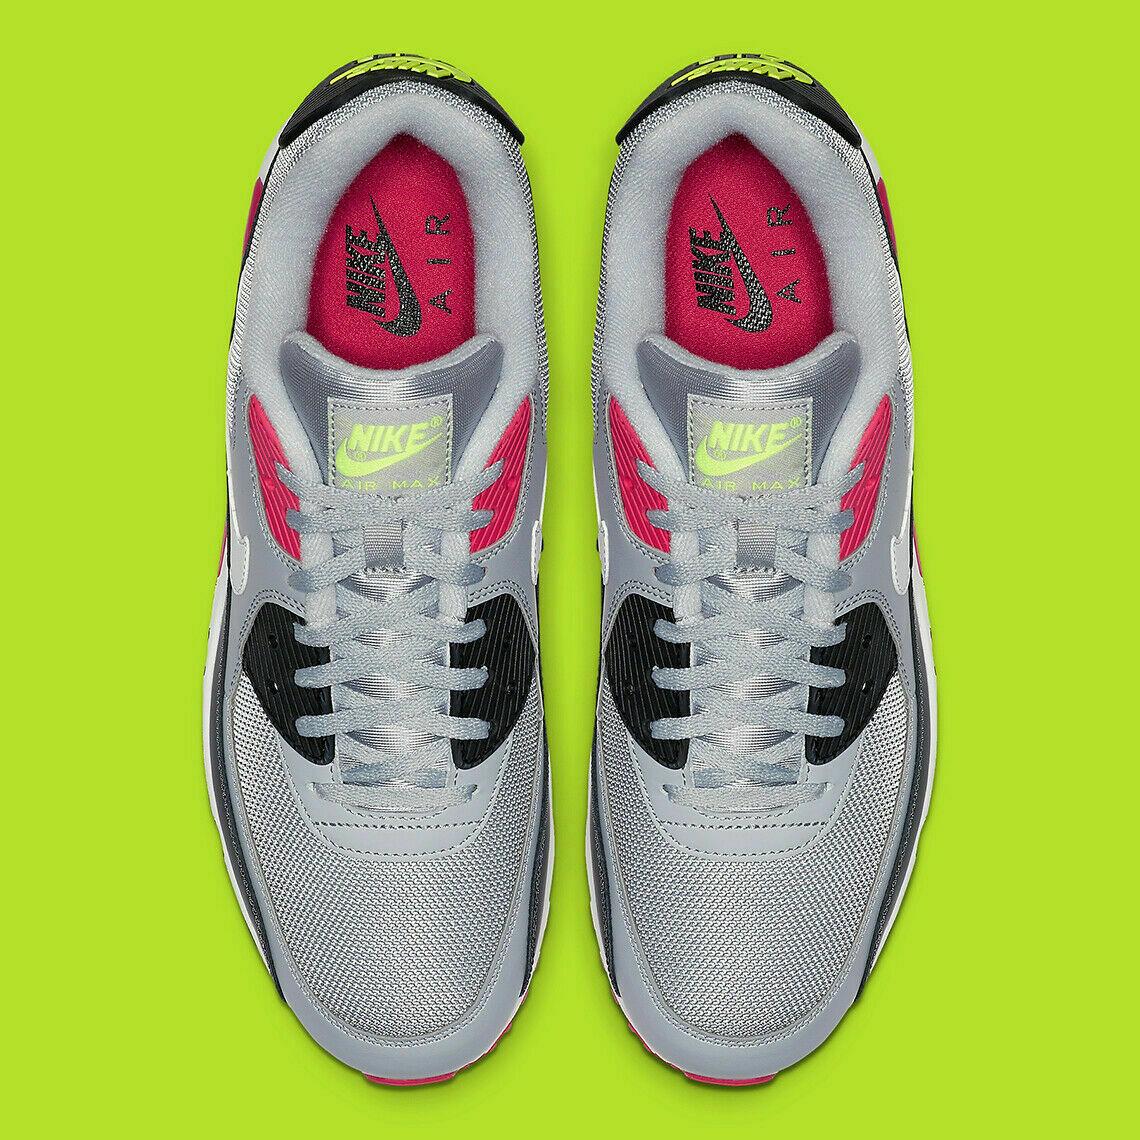 Max Original Sneakers Air Graywhite Men's Nike Shoes 90 mN8nv0Ow